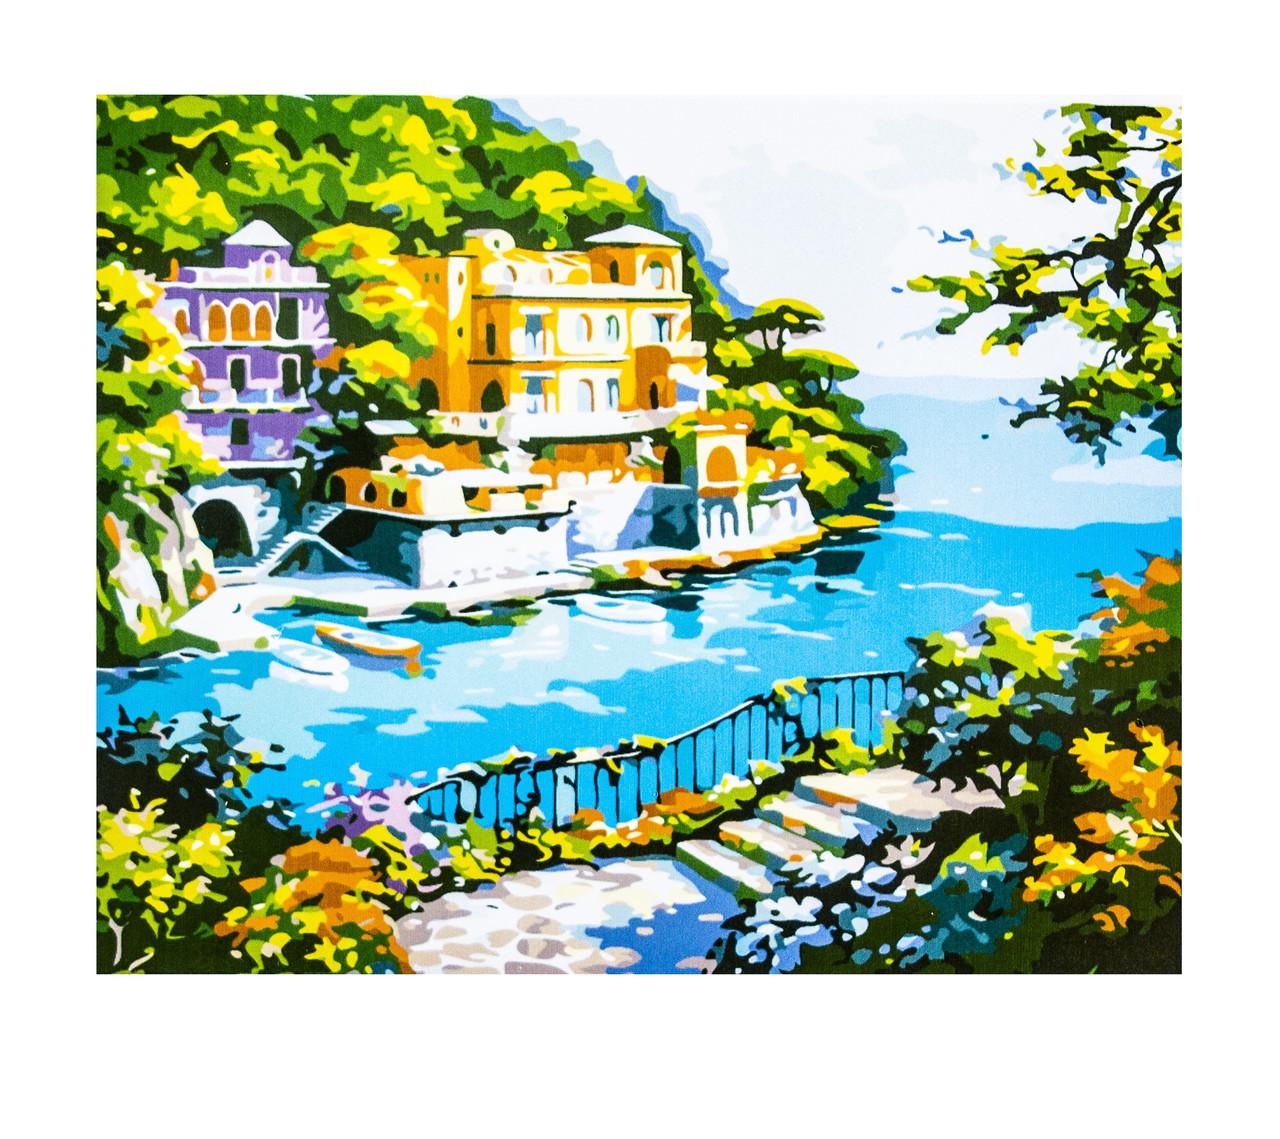 Картина по номерам Пейзаж, размер 40х50